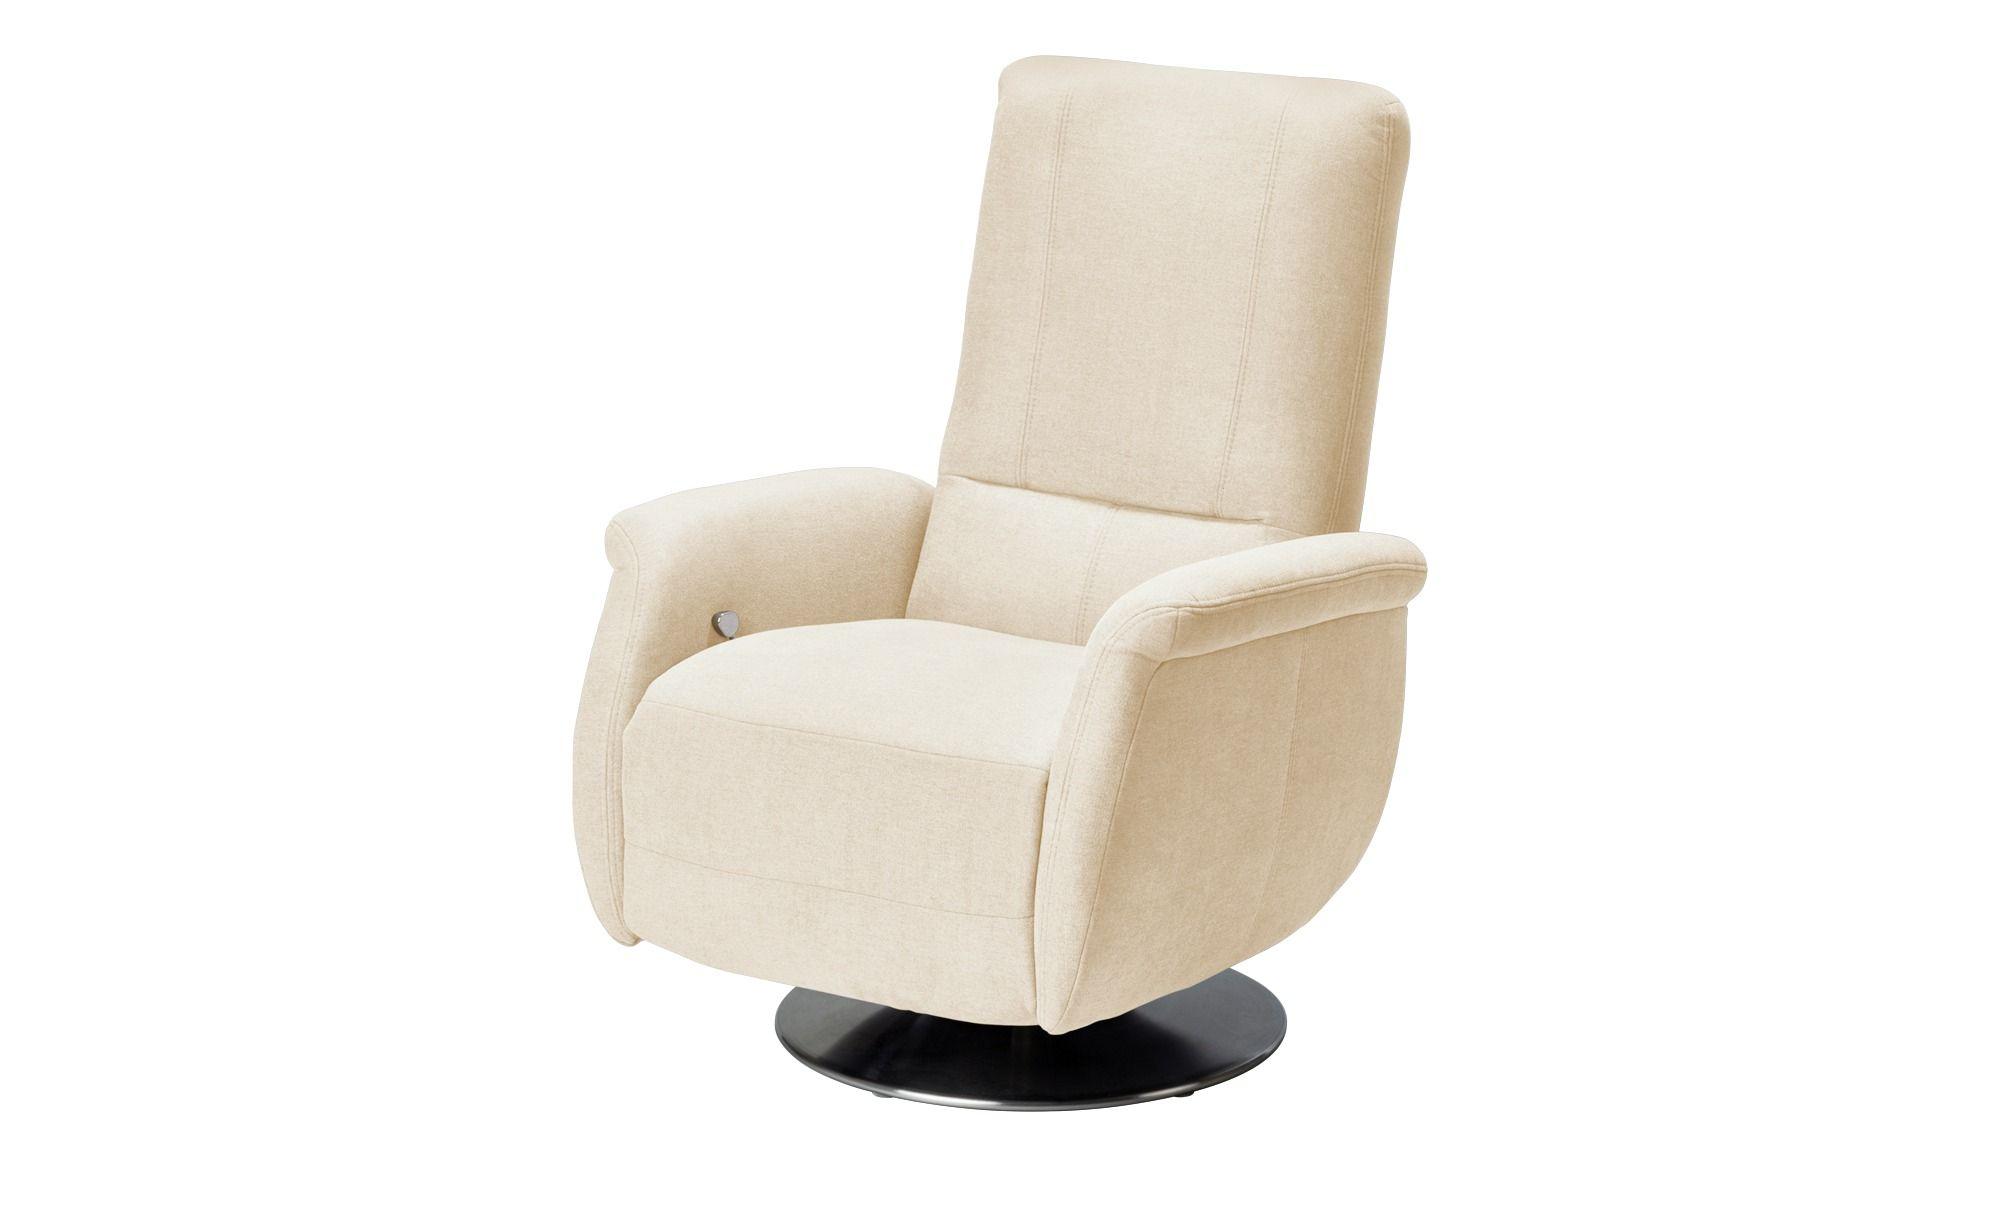 Meinsofa Relaxsessel Beige Stoff Felix Beige Polstermobel Sessel Fernsehsessel Hoffner Fernsehsessel Relaxsessel Sessel